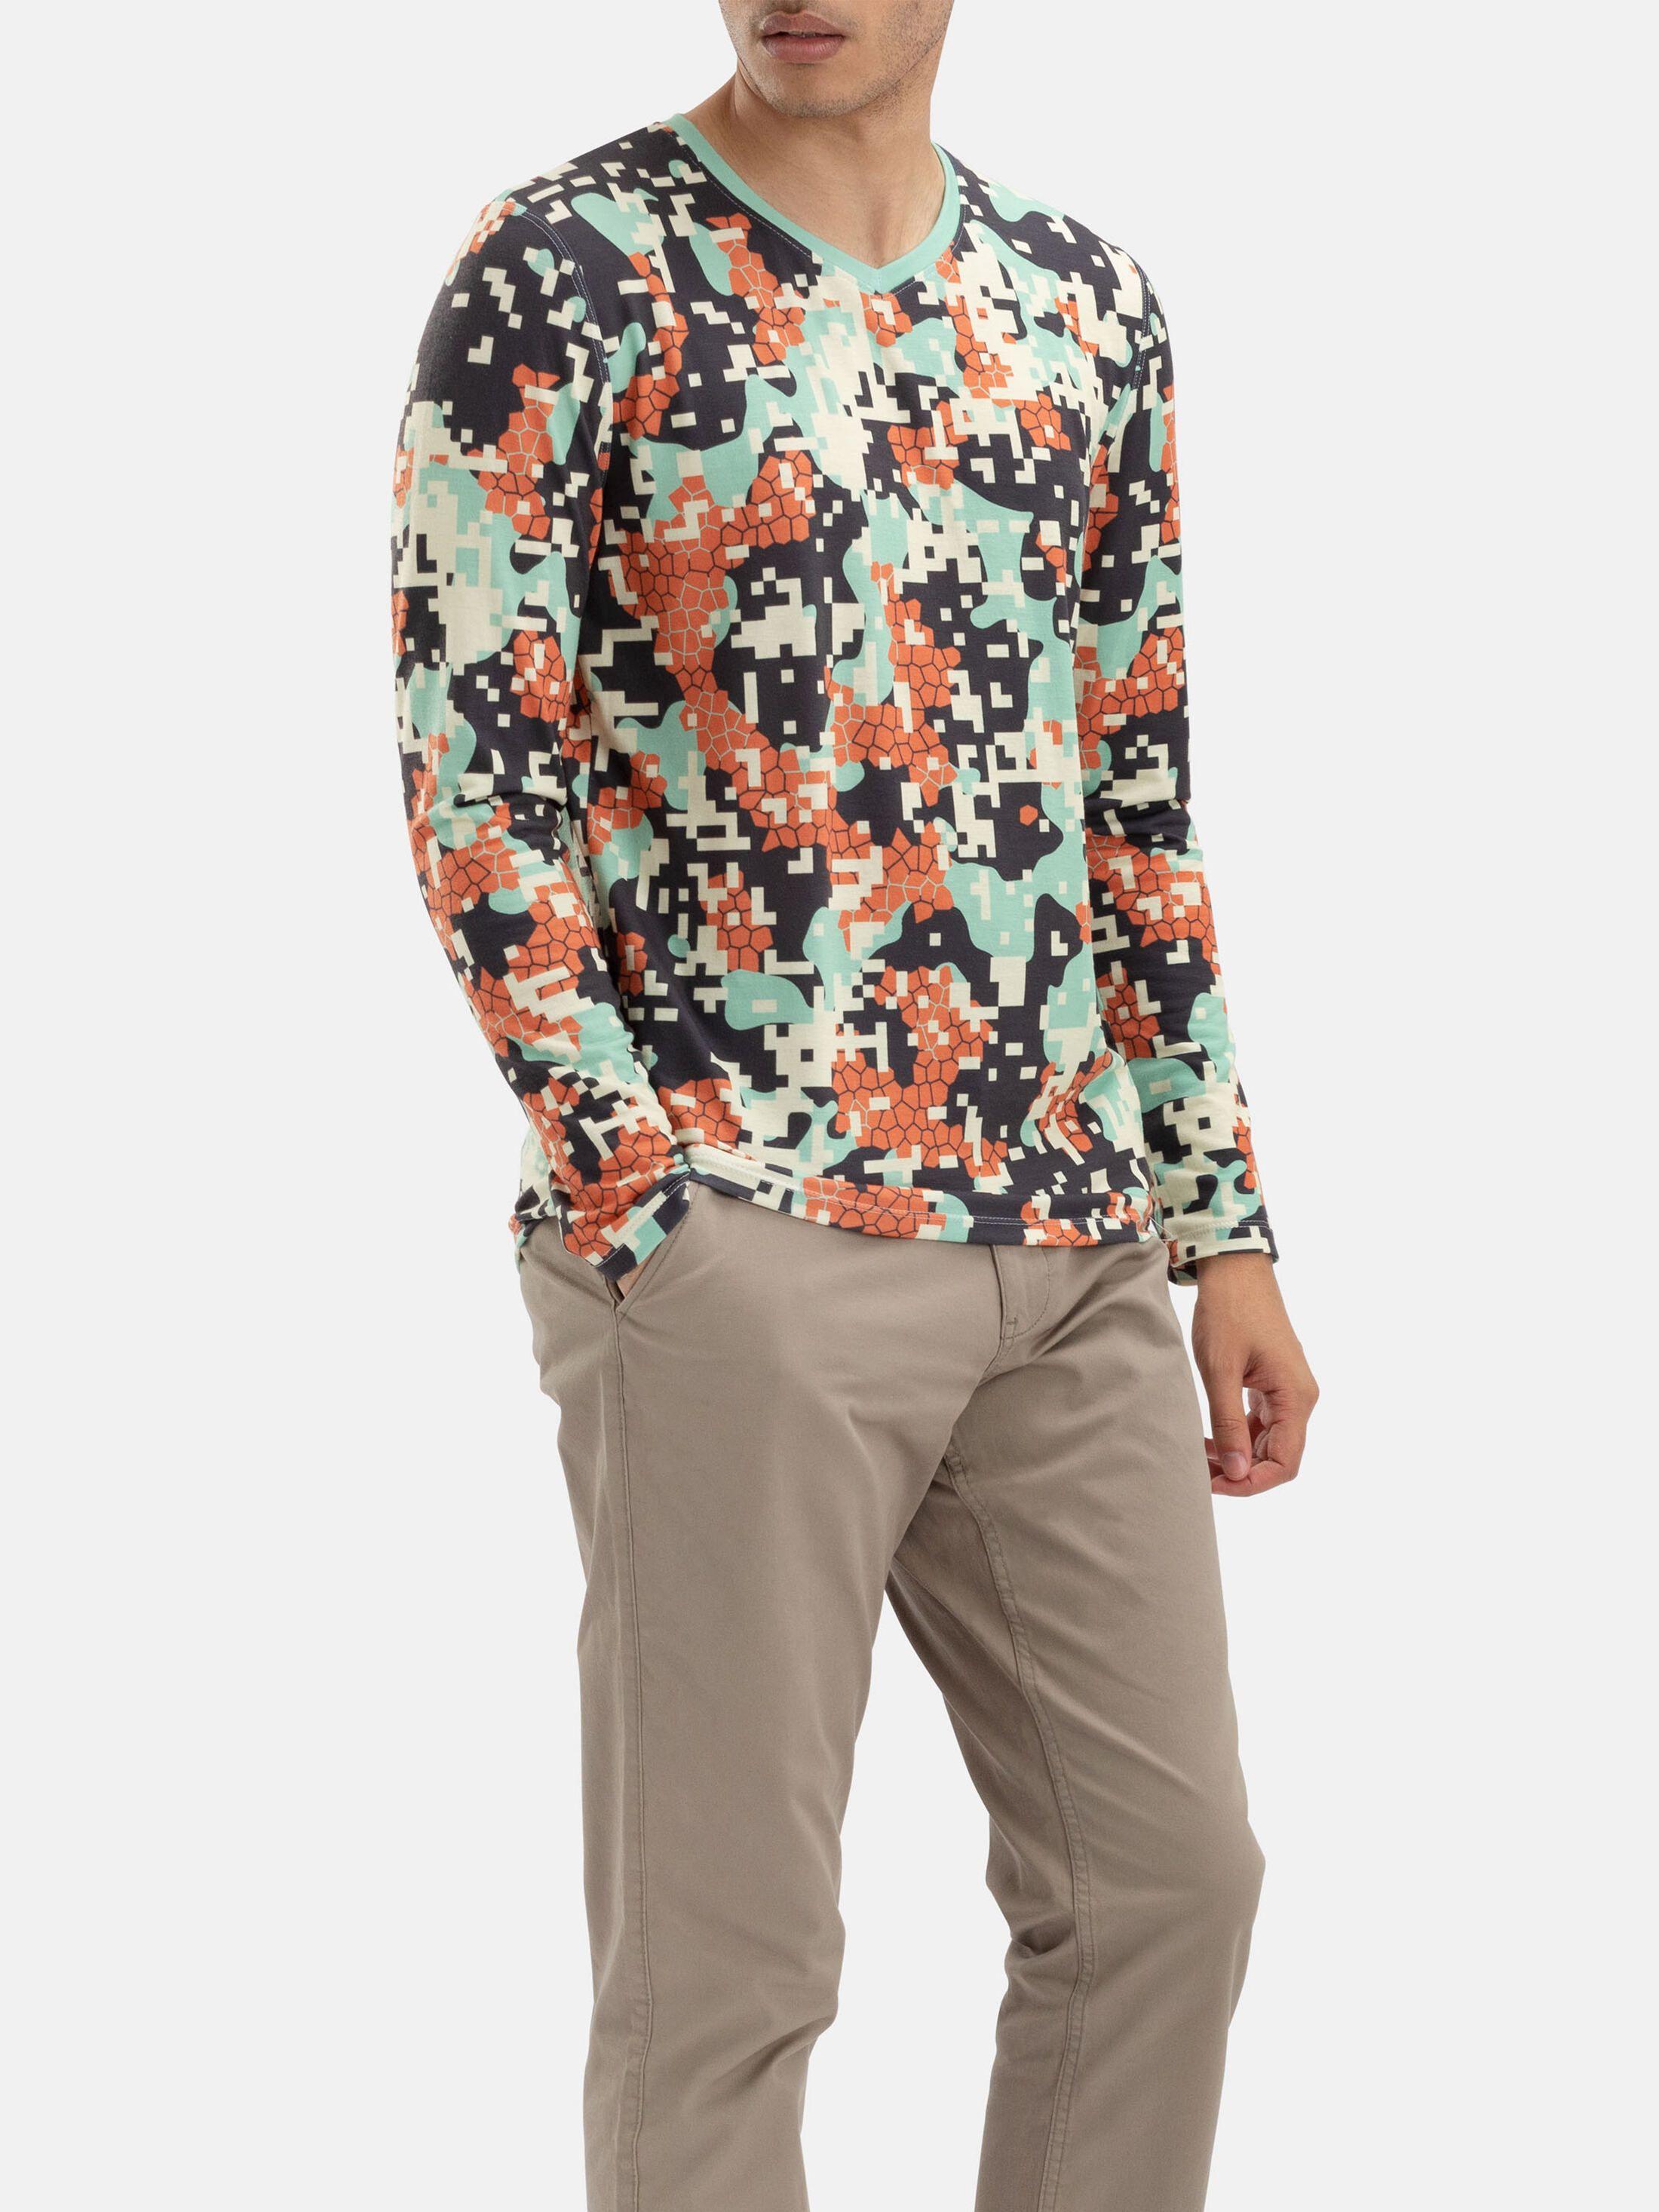 Men's Custom Eco Long Sleeve T-Shirt